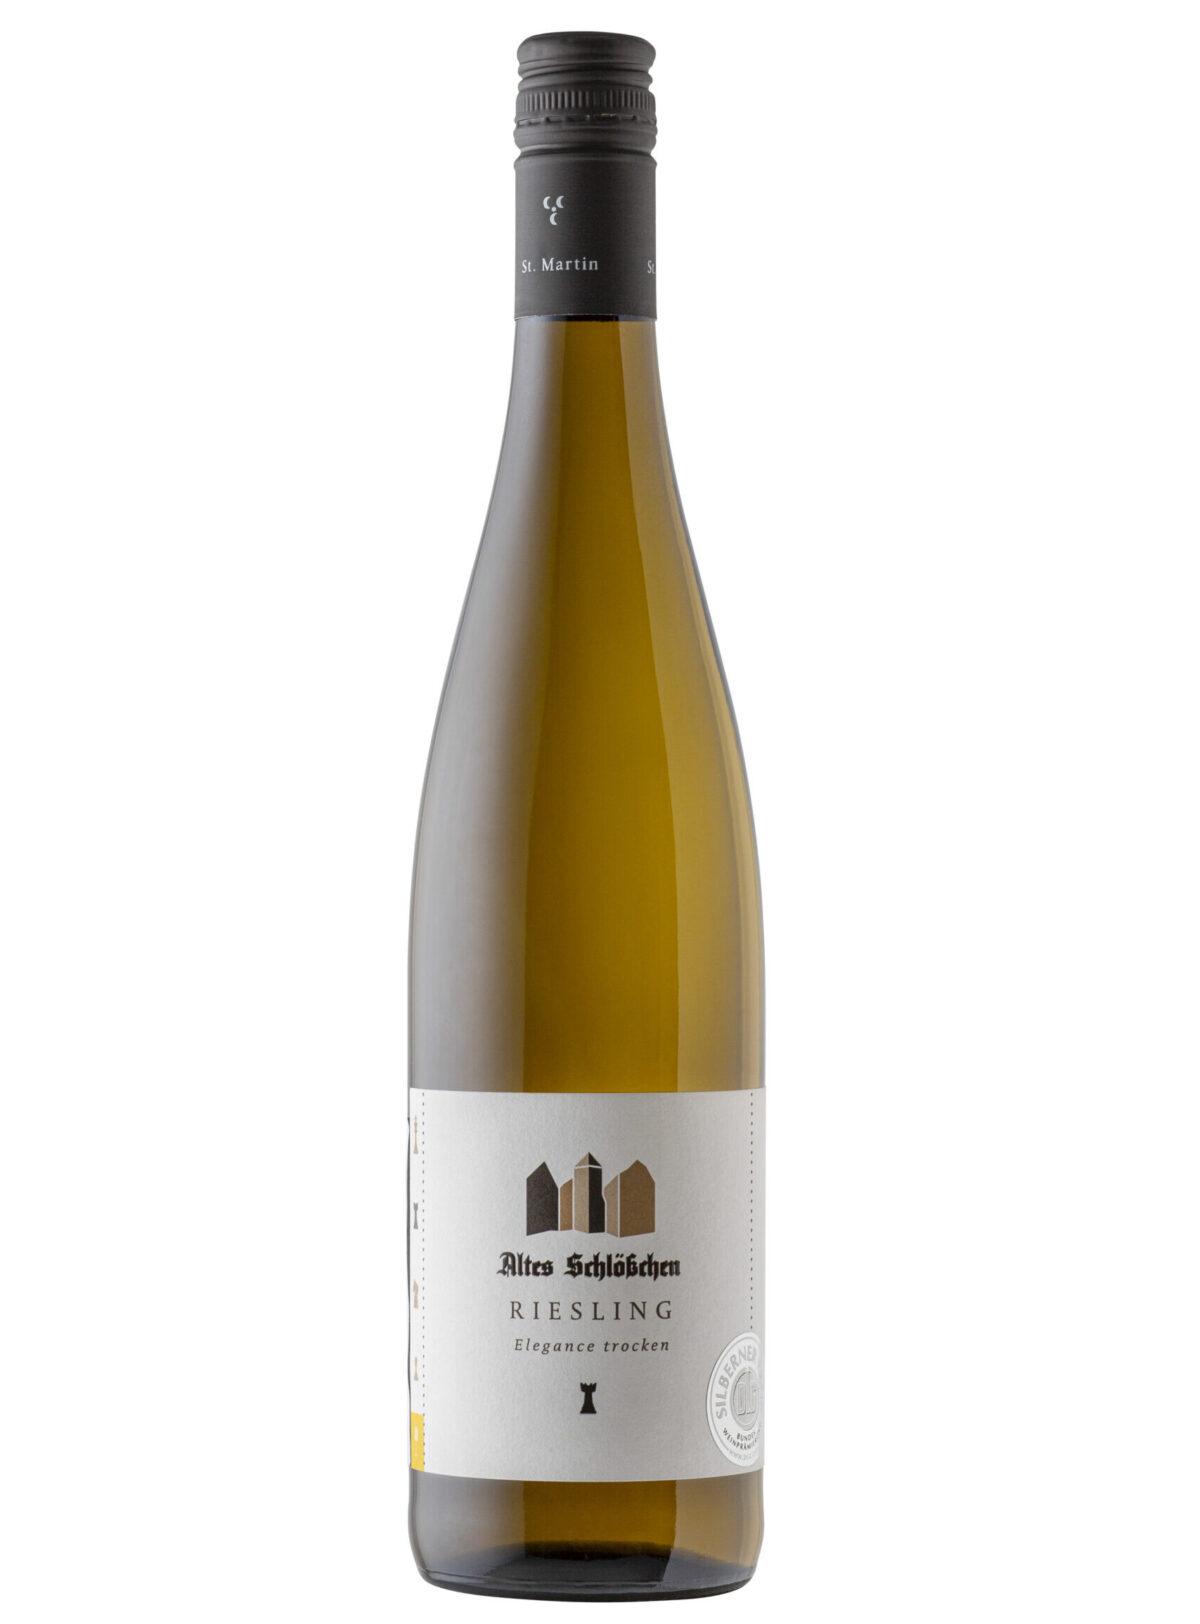 Bottle of Altes Schlosschen Elegance Riesling Wine.